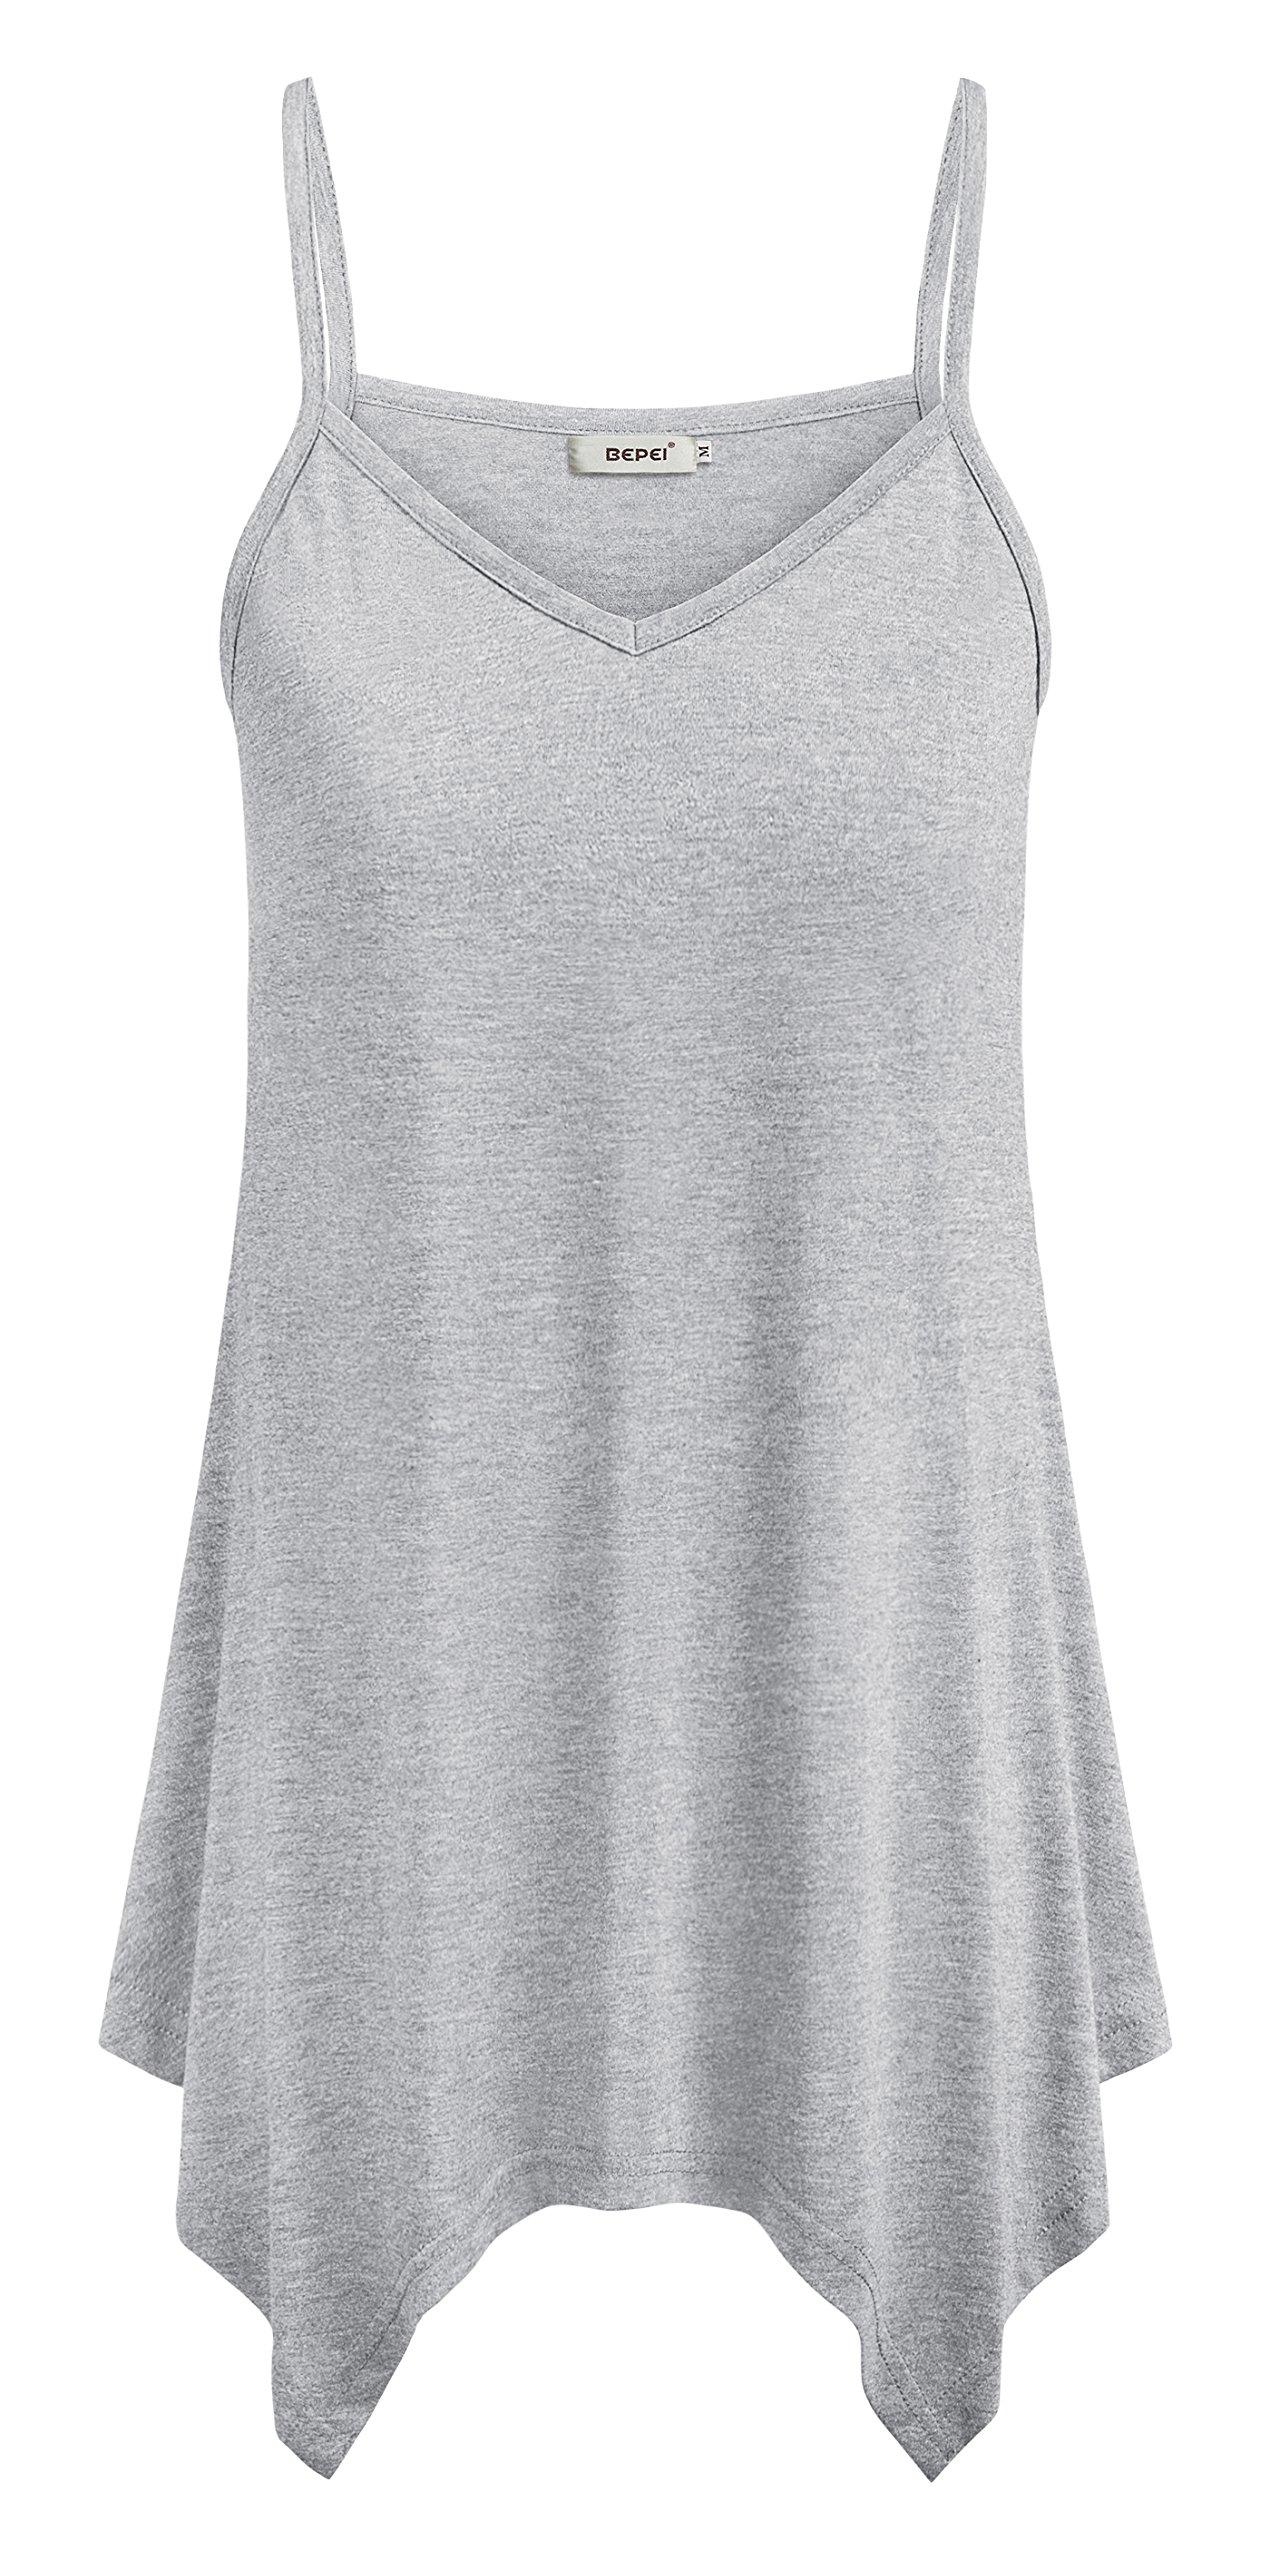 58f48cb92ea7de Galleon - BEPEI Womens Cami Spaghetti Strap Tunic Summer Basic Blouses  Lightweight Casual Handkerchief Hem Tank Tops